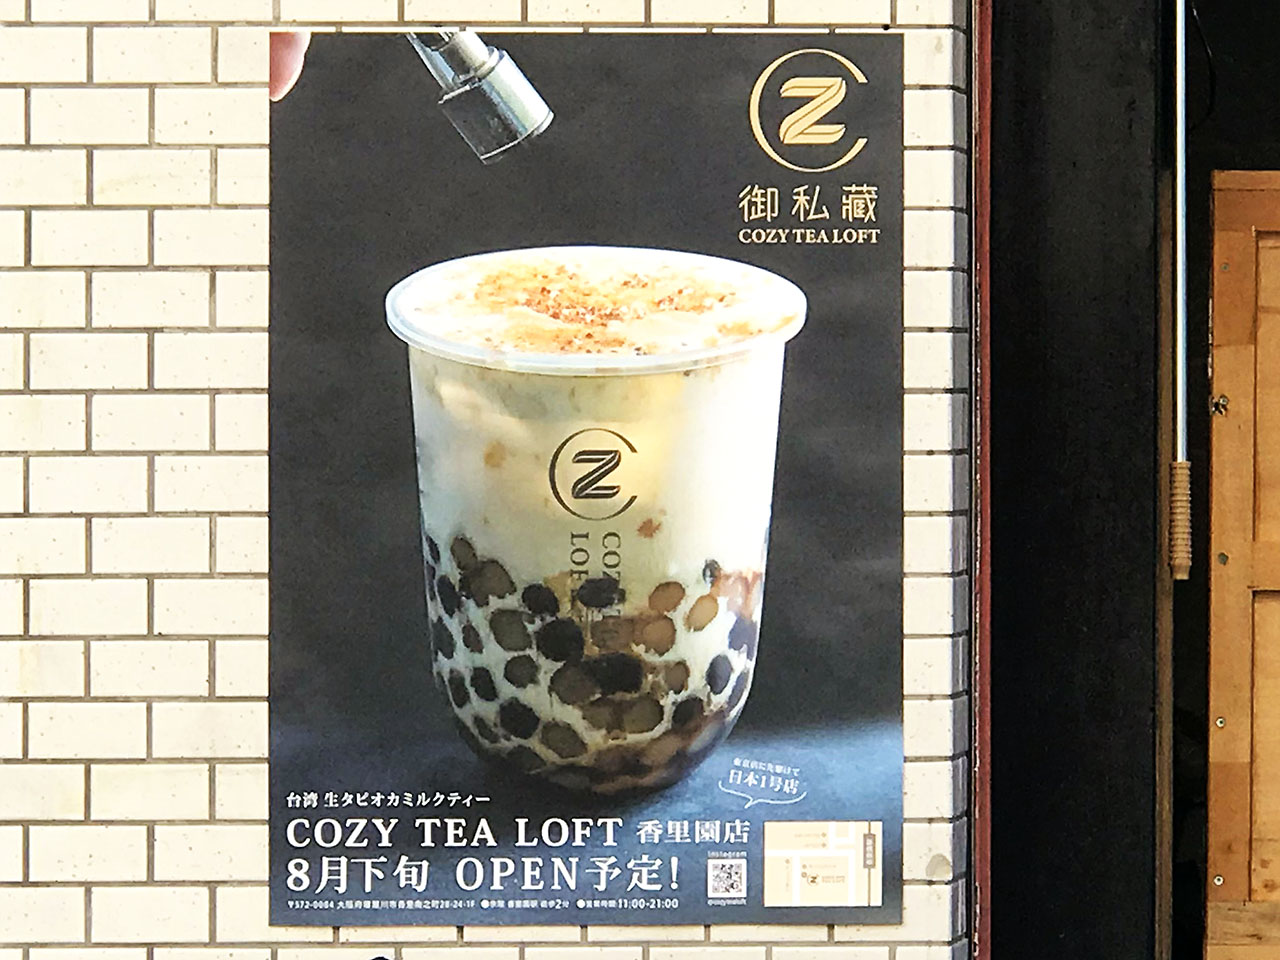 COZY TEA LOFT (御私藏) タピオカミルクティ